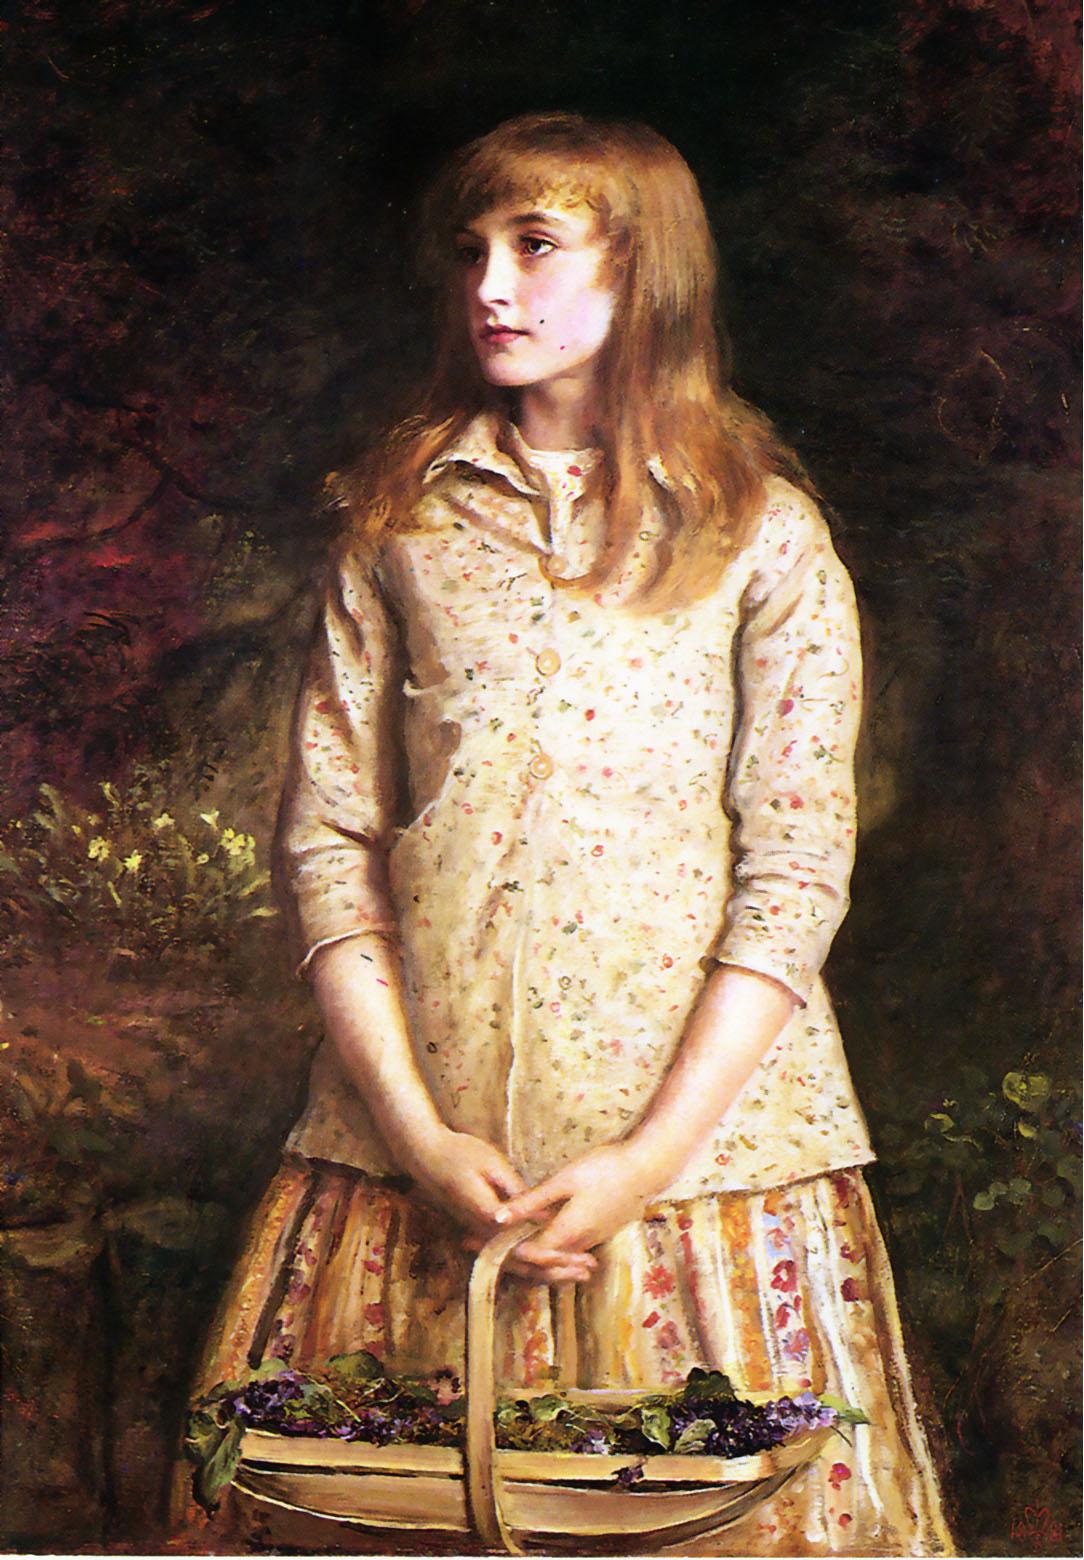 Arte e Estética - Página 5 Sweetest-eyes-that-were-ever-seen-1881